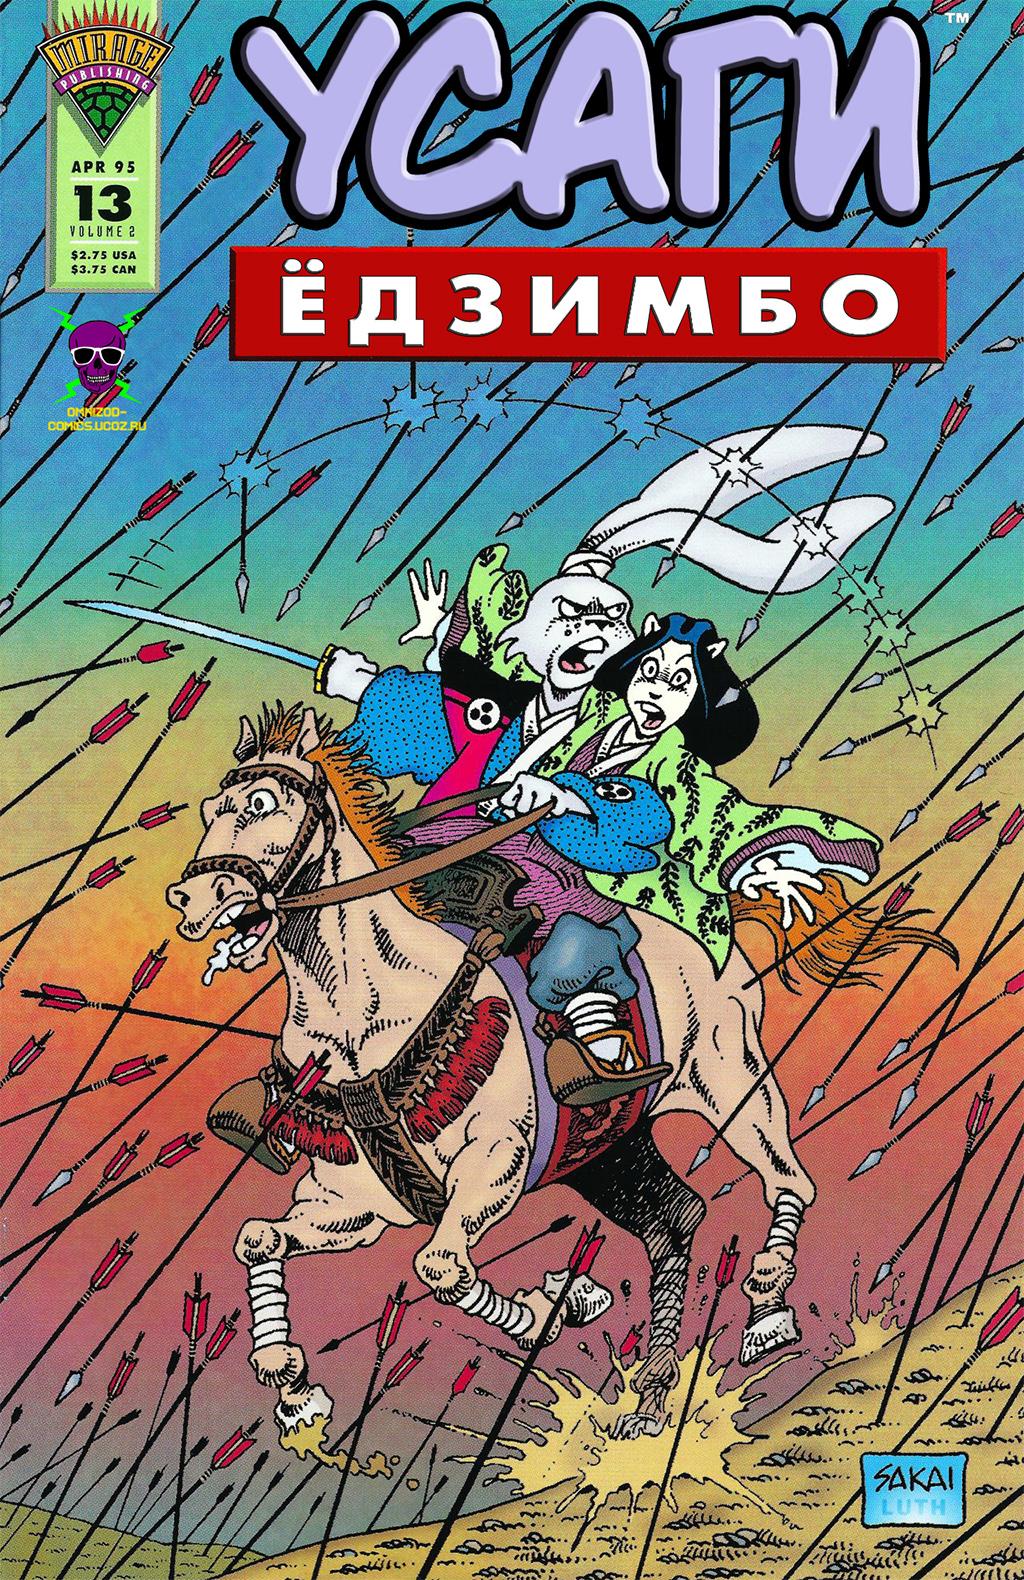 Комикс Усаги Ёдзимбо том 2